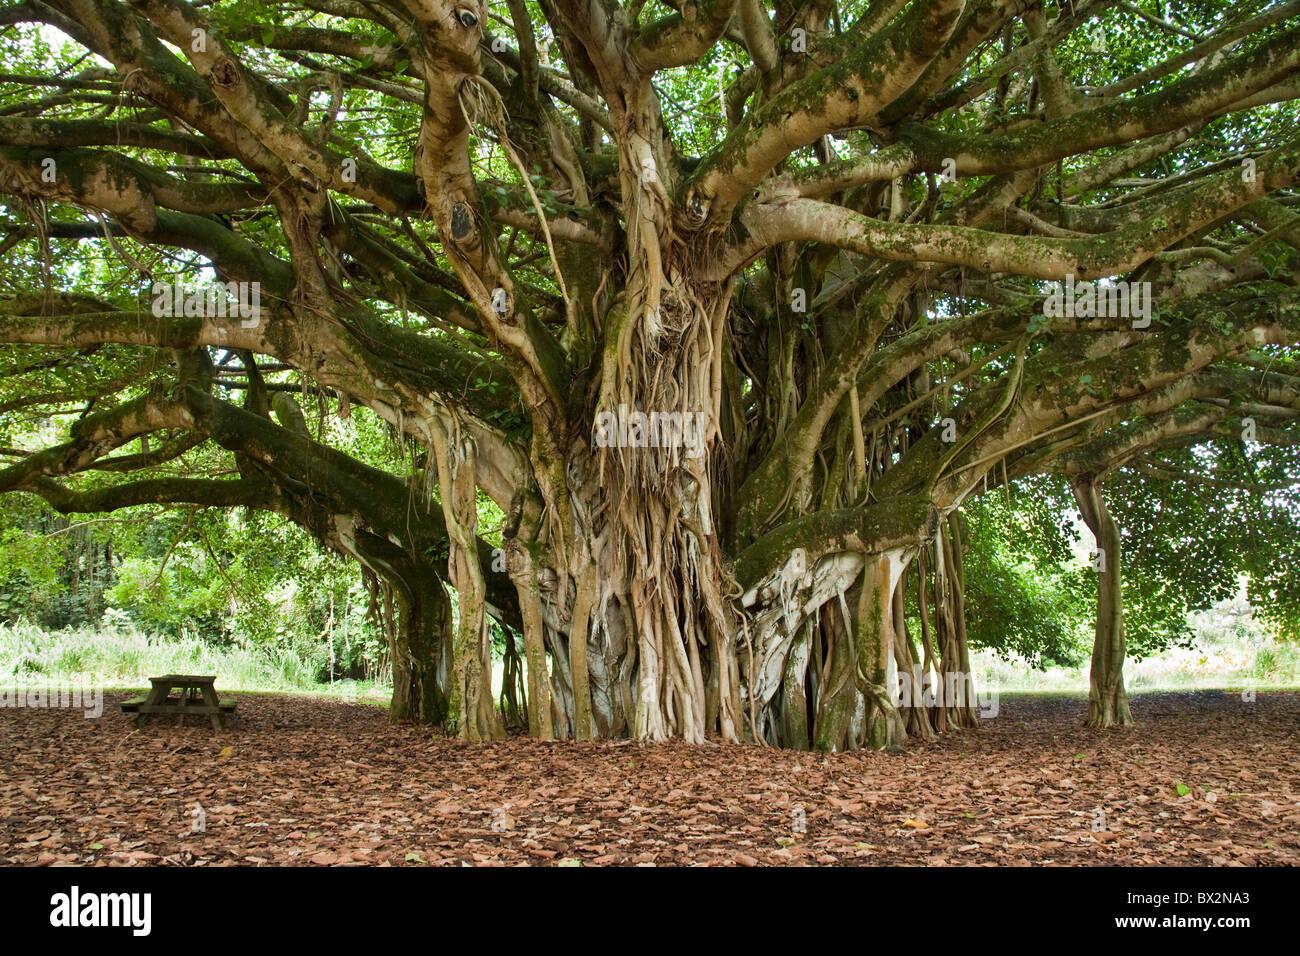 Mature Banyan Tree, aerial prop roots, - Stock Image